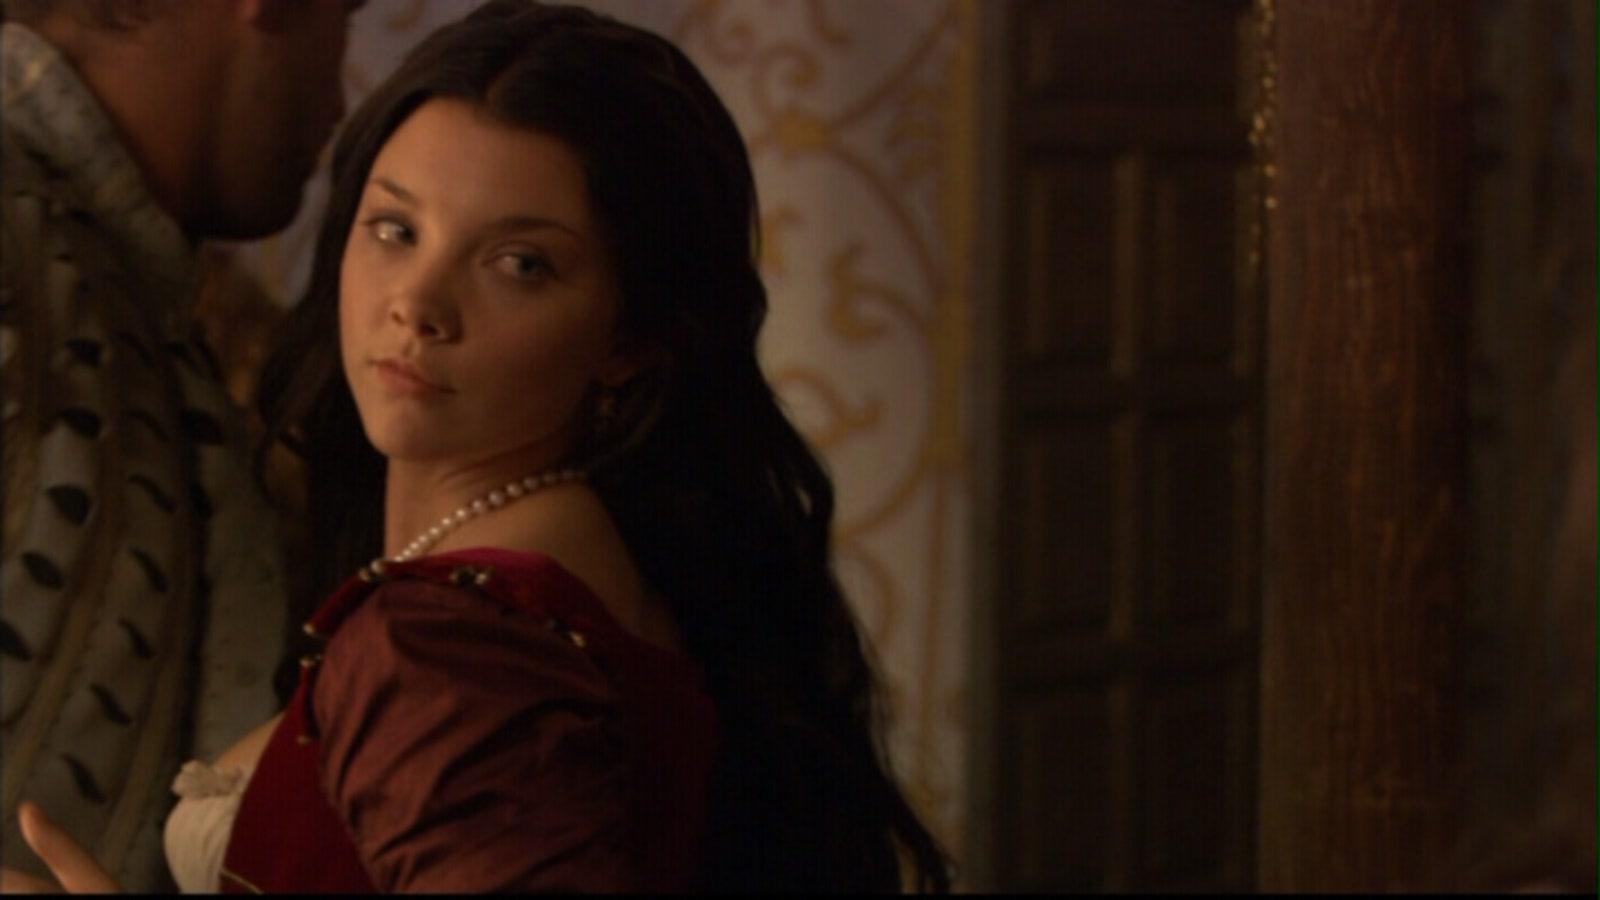 Natalie Dormer As Anne Boleyn Quotes